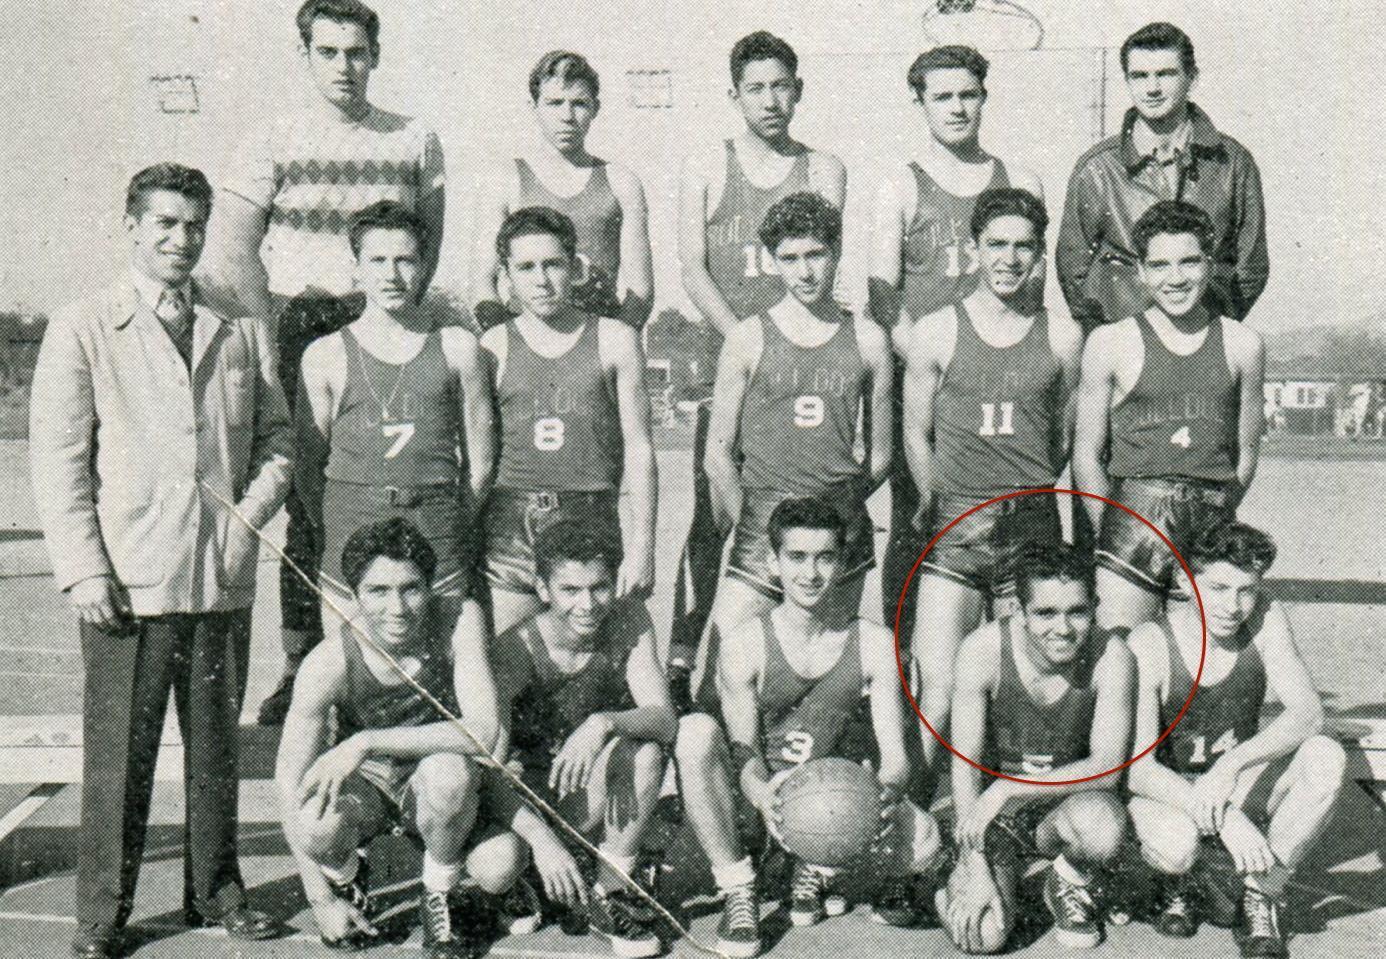 William Cruz, B Basketball, 1949